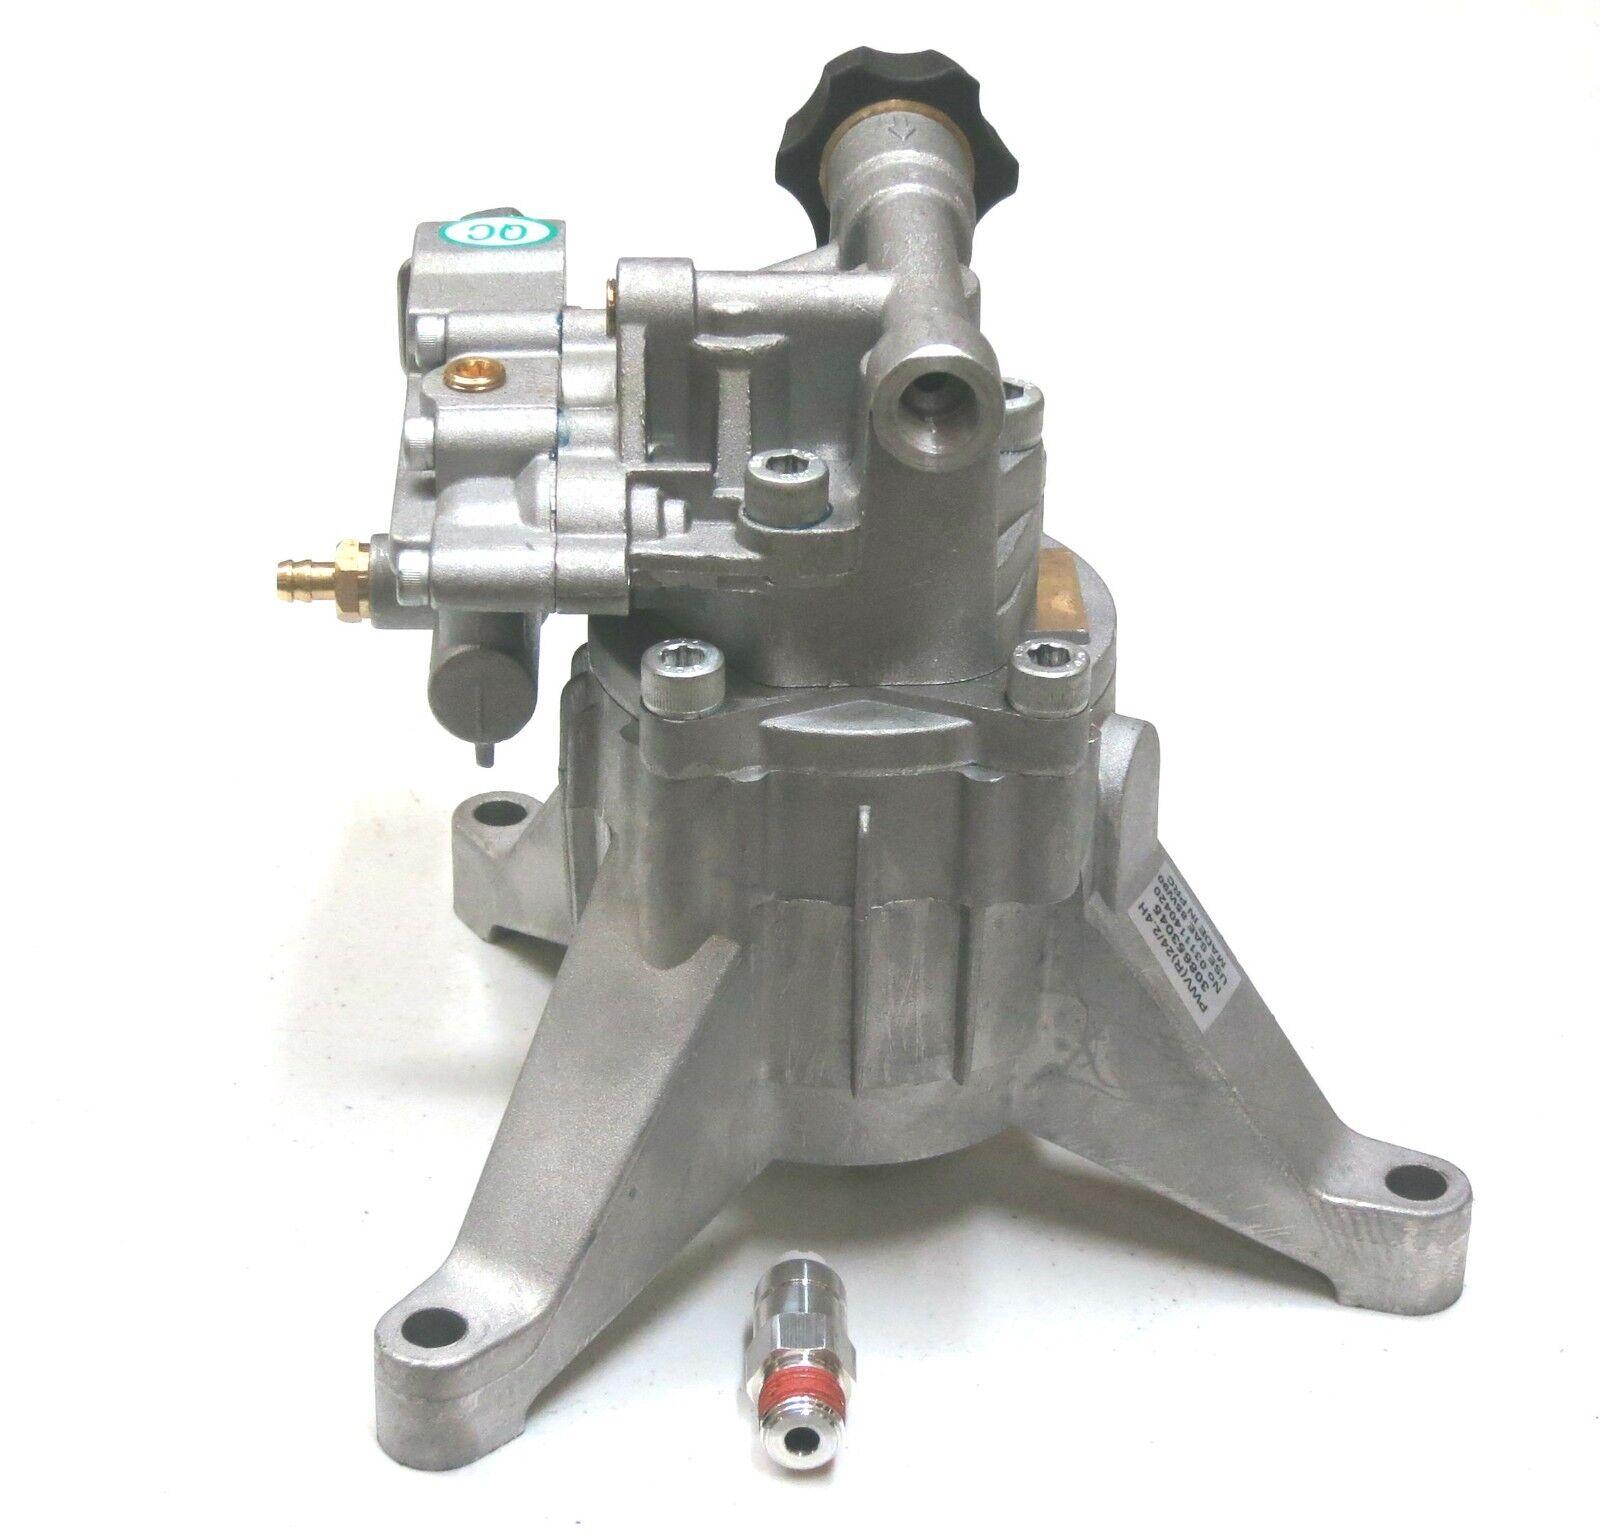 troy bilt pressure washer parts diagram bronco transmission belt new 2800 psi power water pump